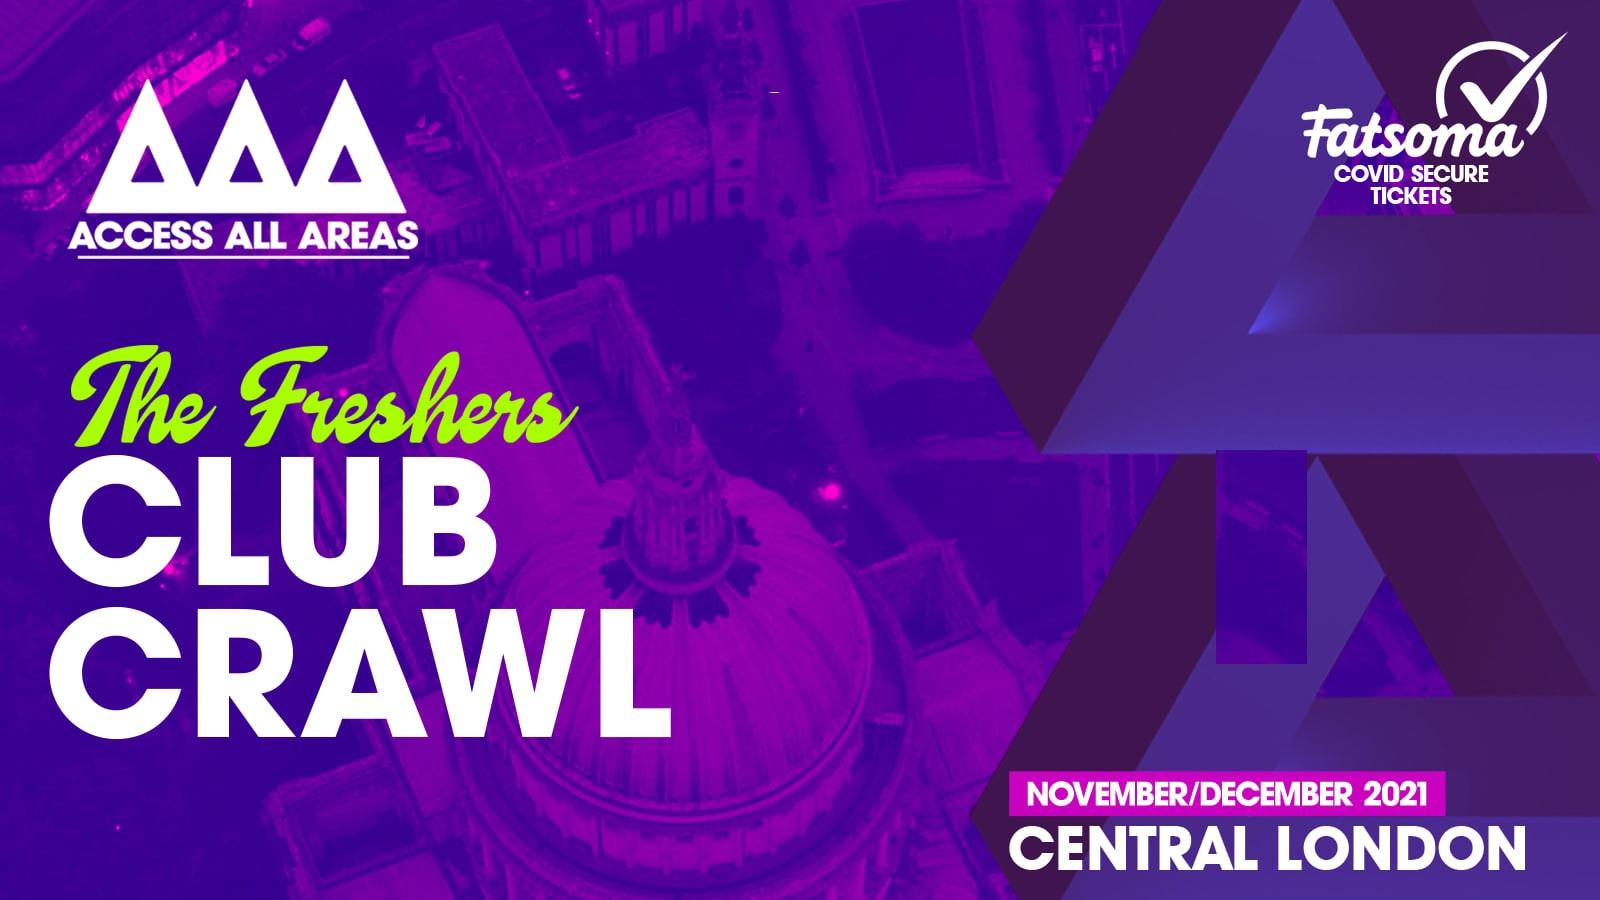 The Friday Night Freshers Club Crawl 🍻 November 19th 2021 💥